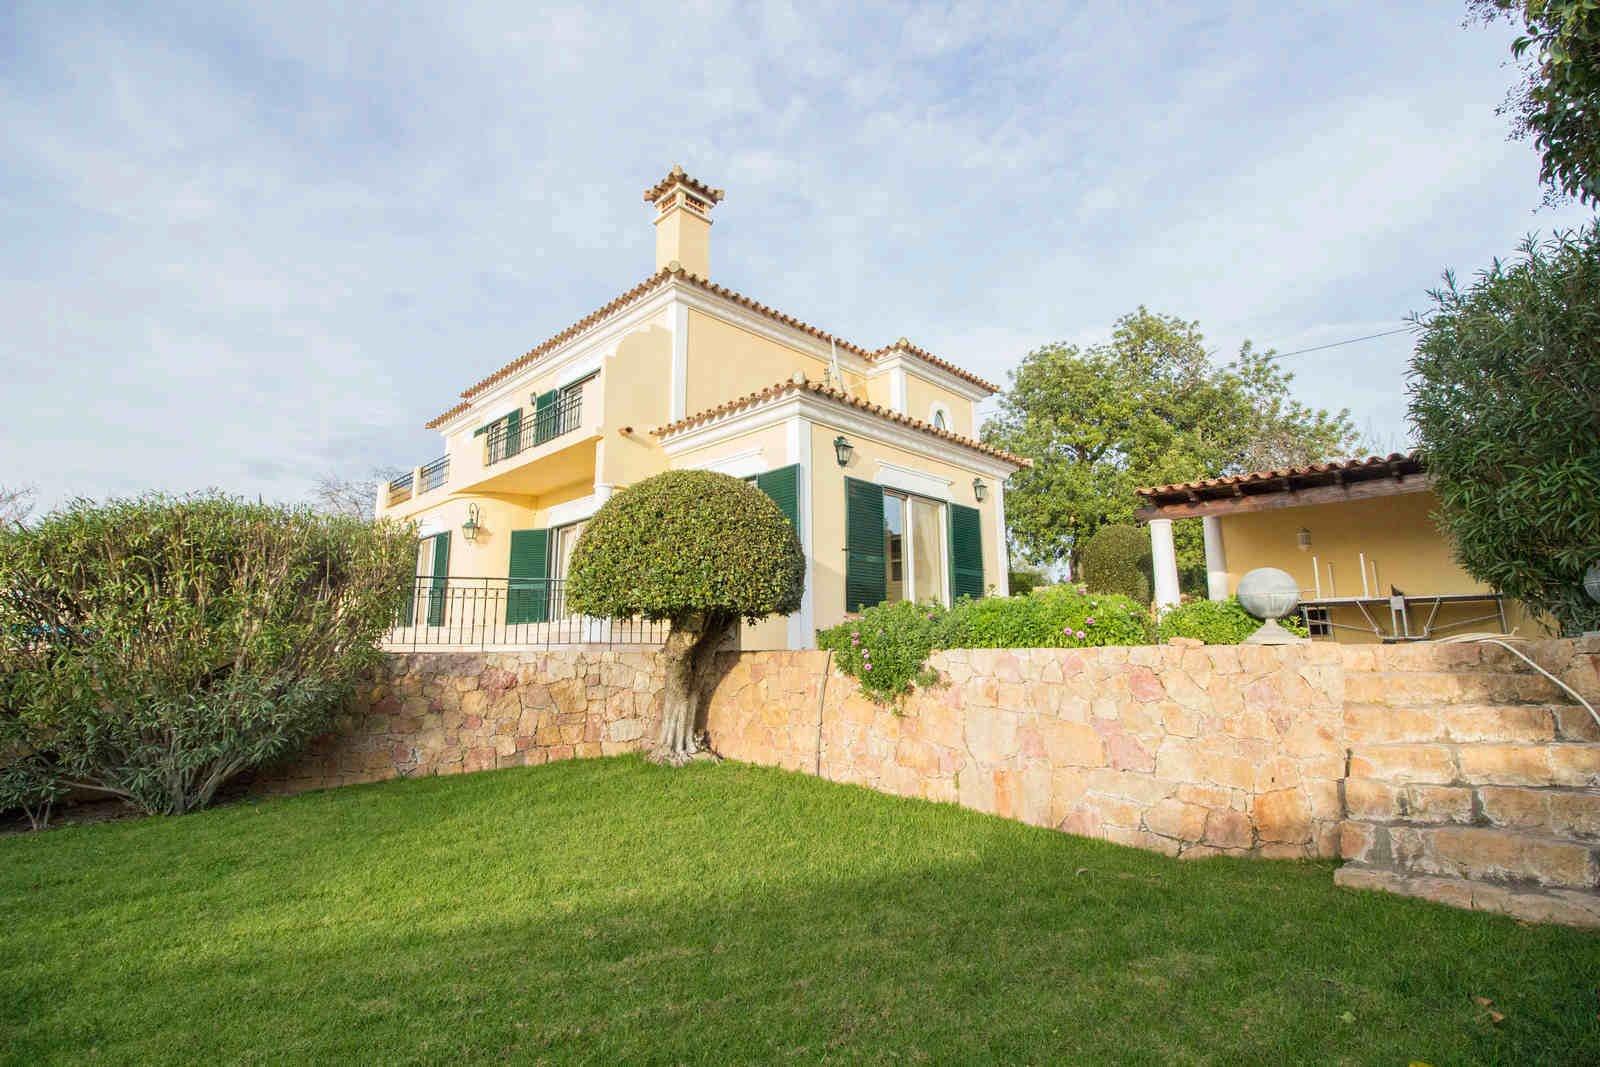 4 Bedroom Villa Almancil, Central Algarve Ref: PV3540